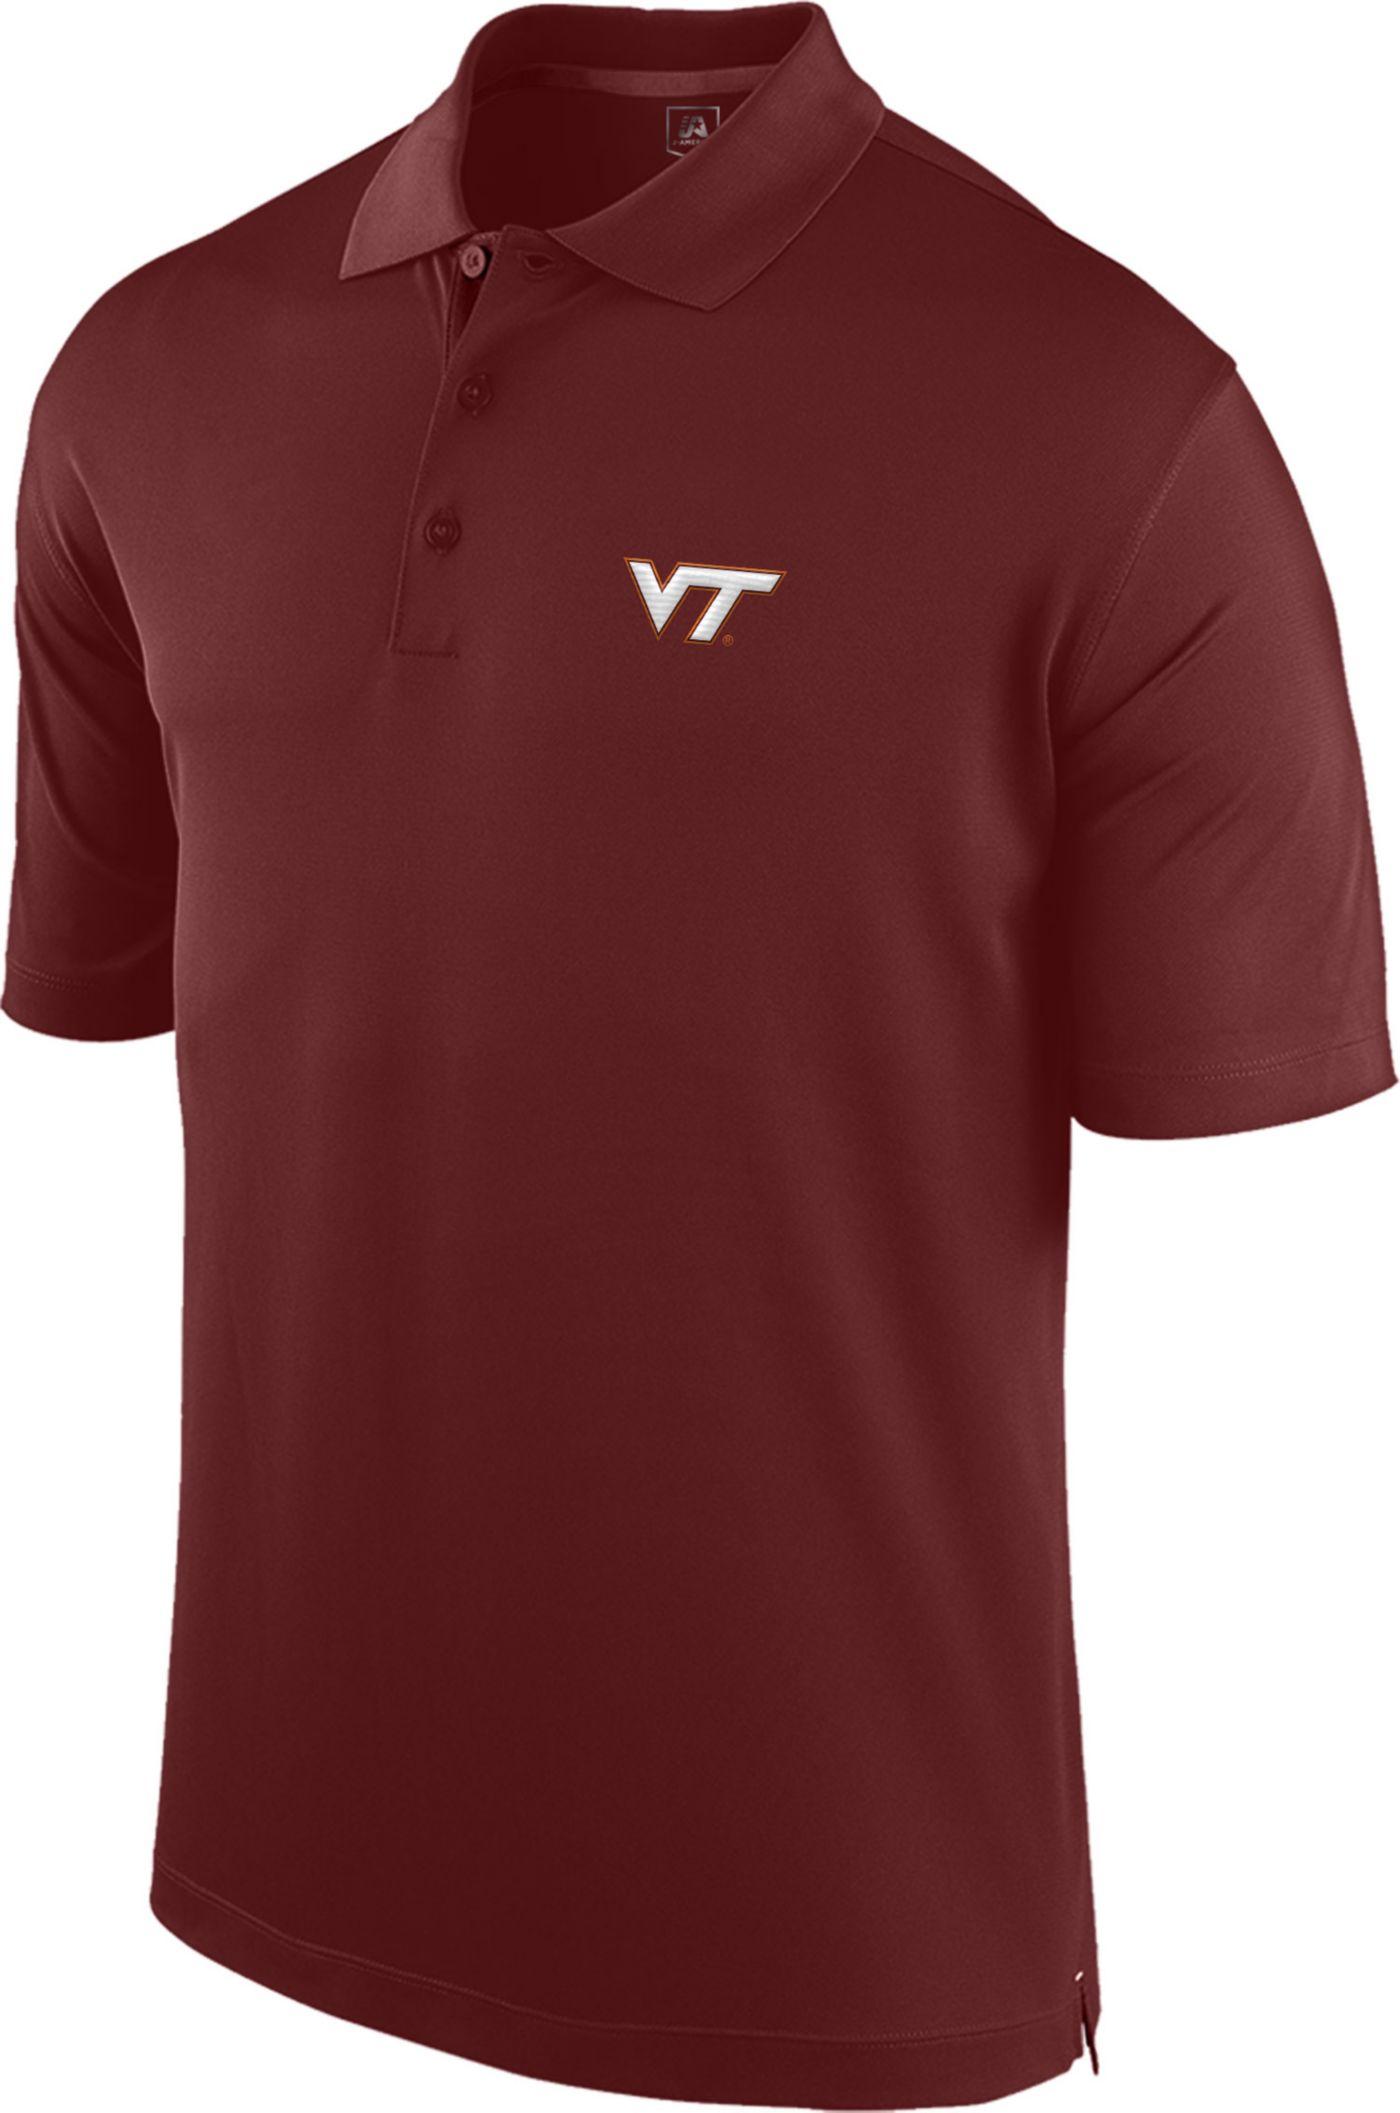 J. America Men's Virginia Tech Hokies Maroon Spector Polo